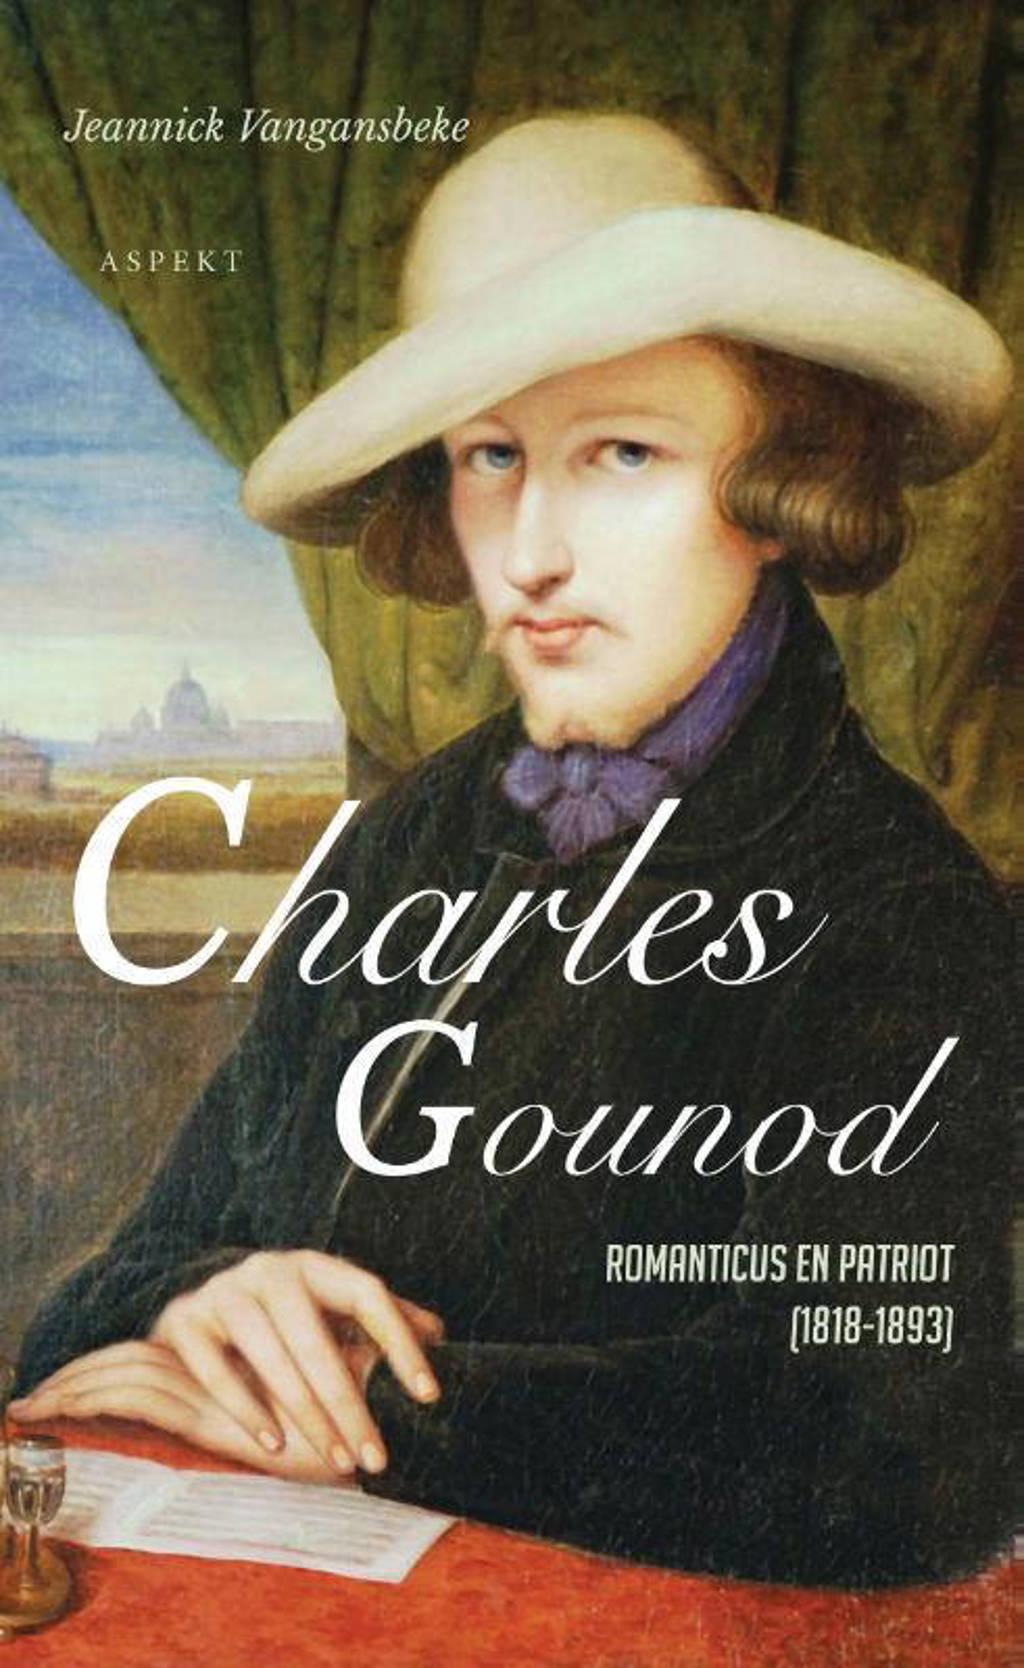 Charles Gounod - Jeannick Vangansbeke